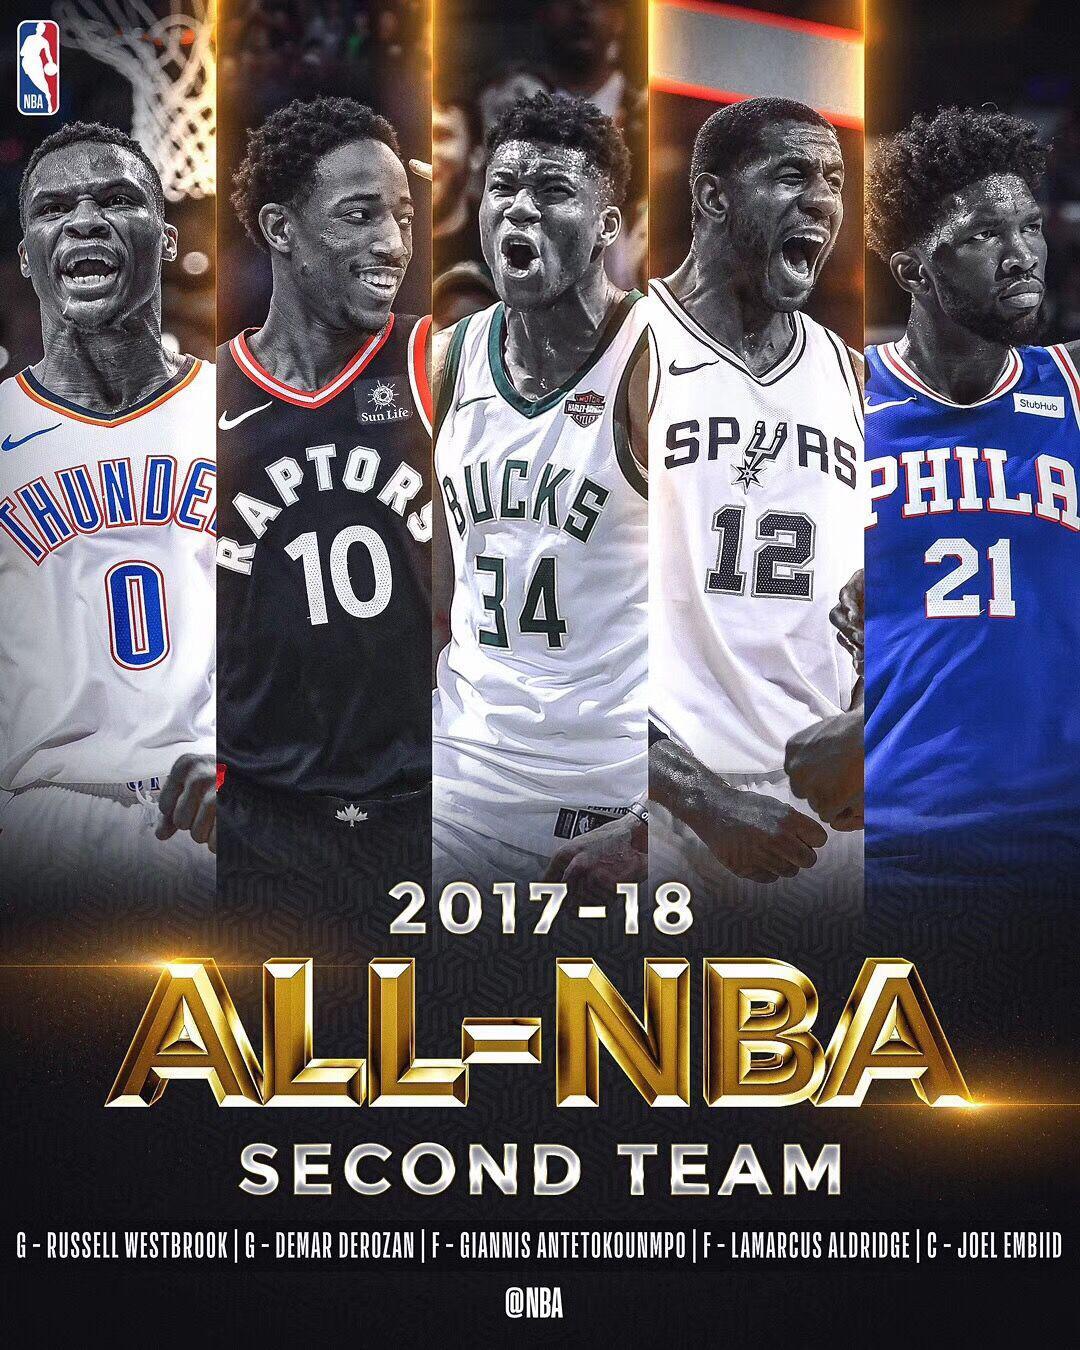 NBA最佳阵容出炉:东西詹全票 利拉德KD浓眉入一阵